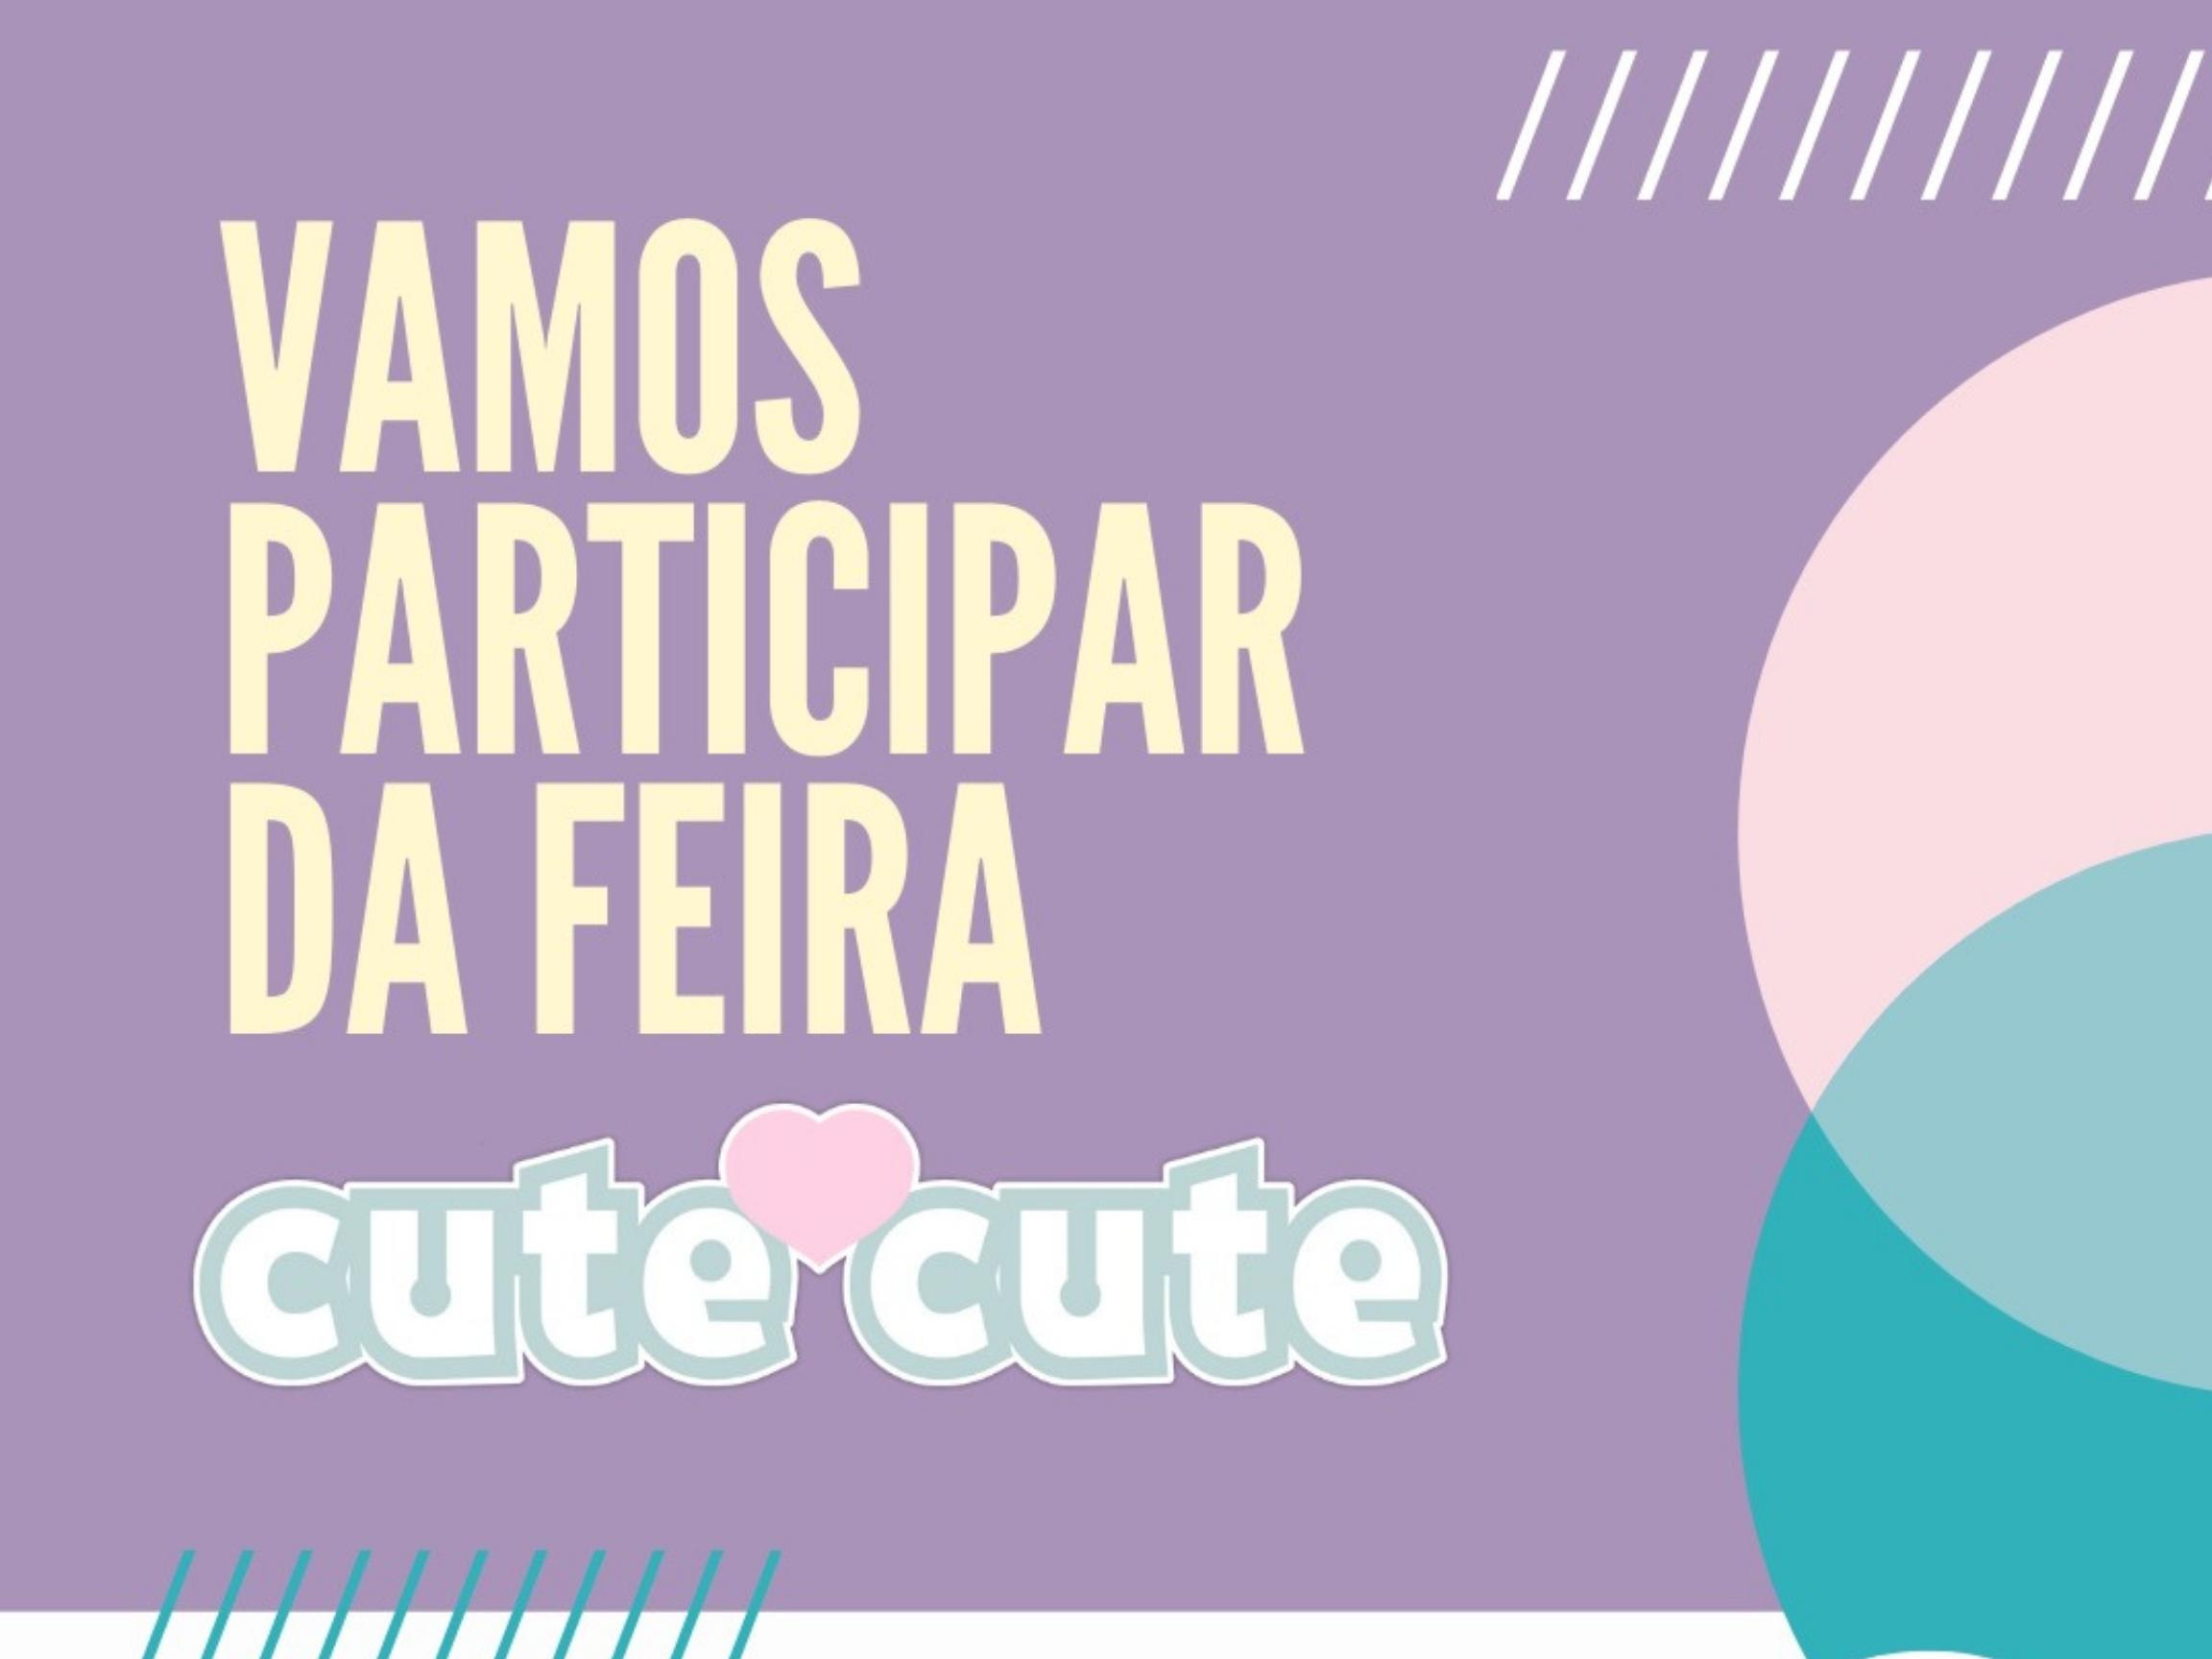 Colo de Mãe confirma presença na feira Cute Cute